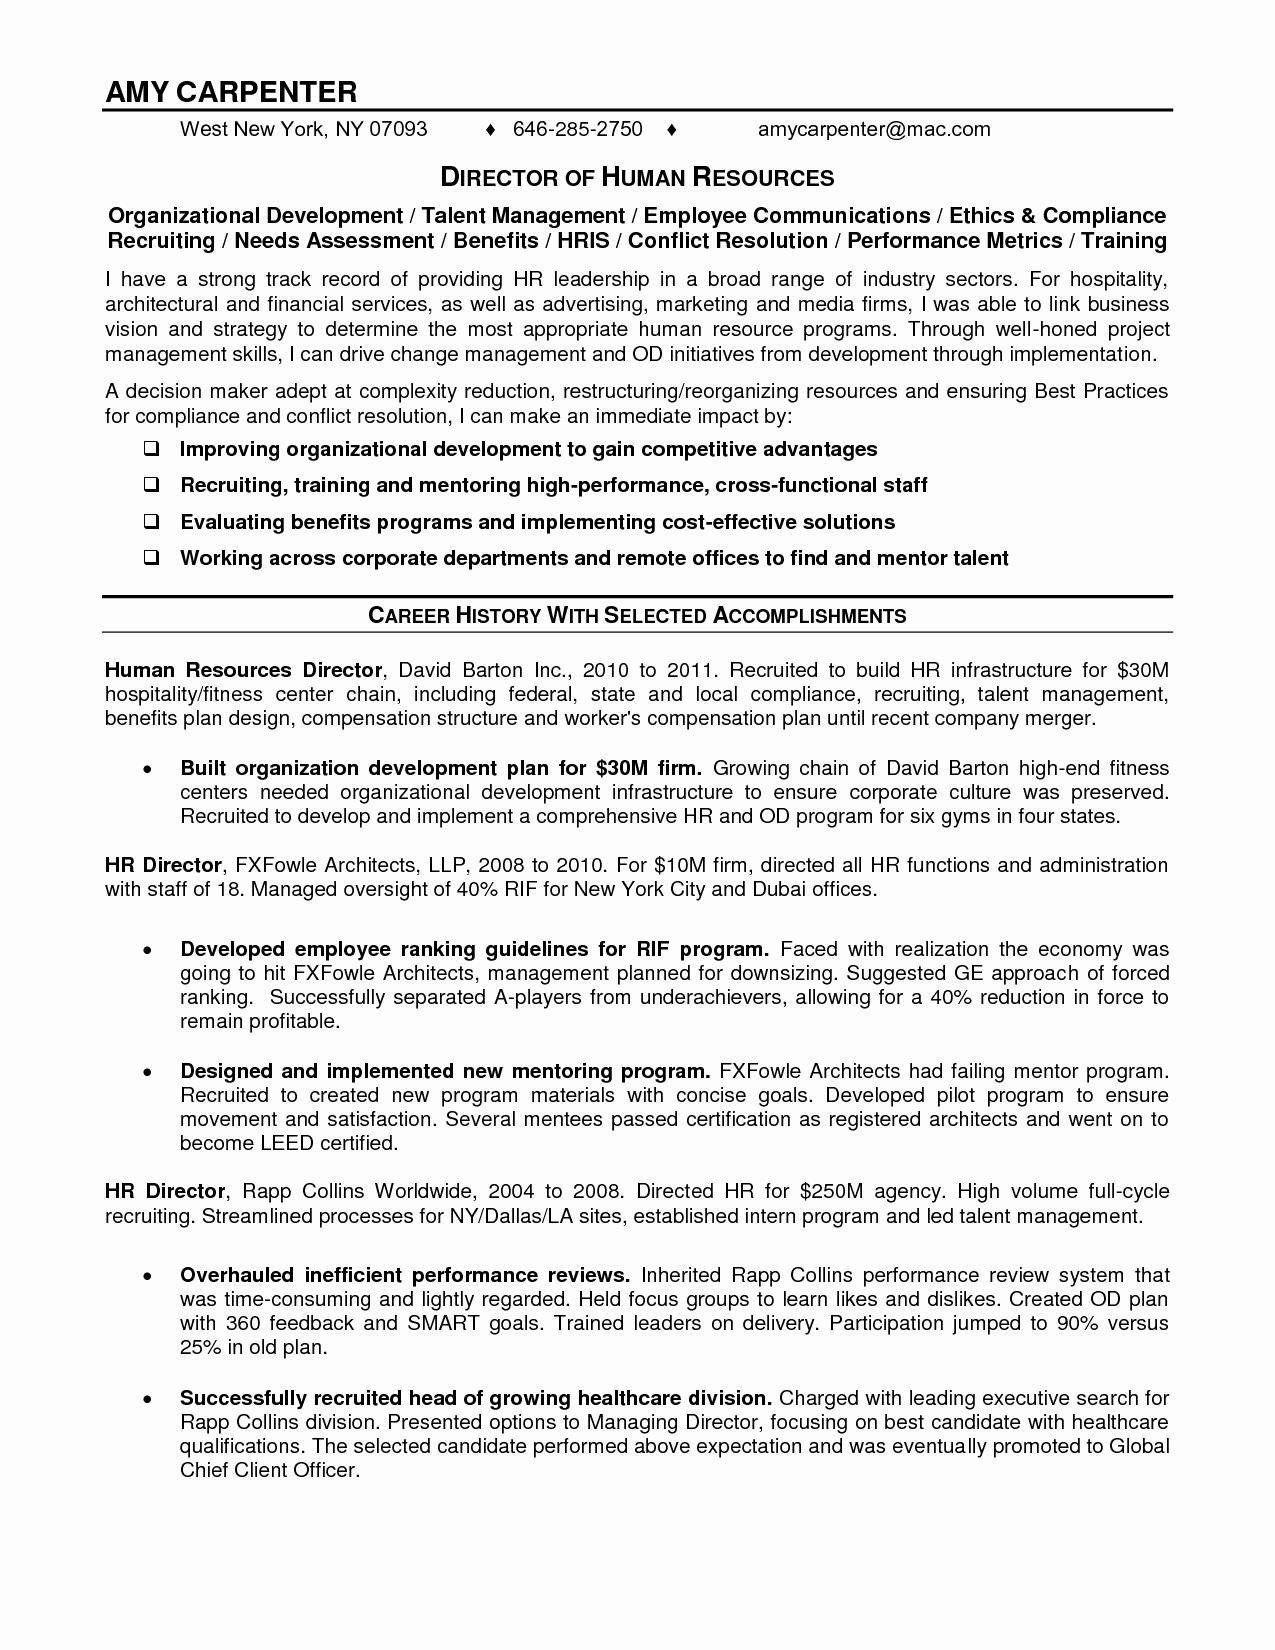 Grad School Resume Example New Objective For Graduate In 2020 Skill Teacher 2017 Dissertation Intern Fed